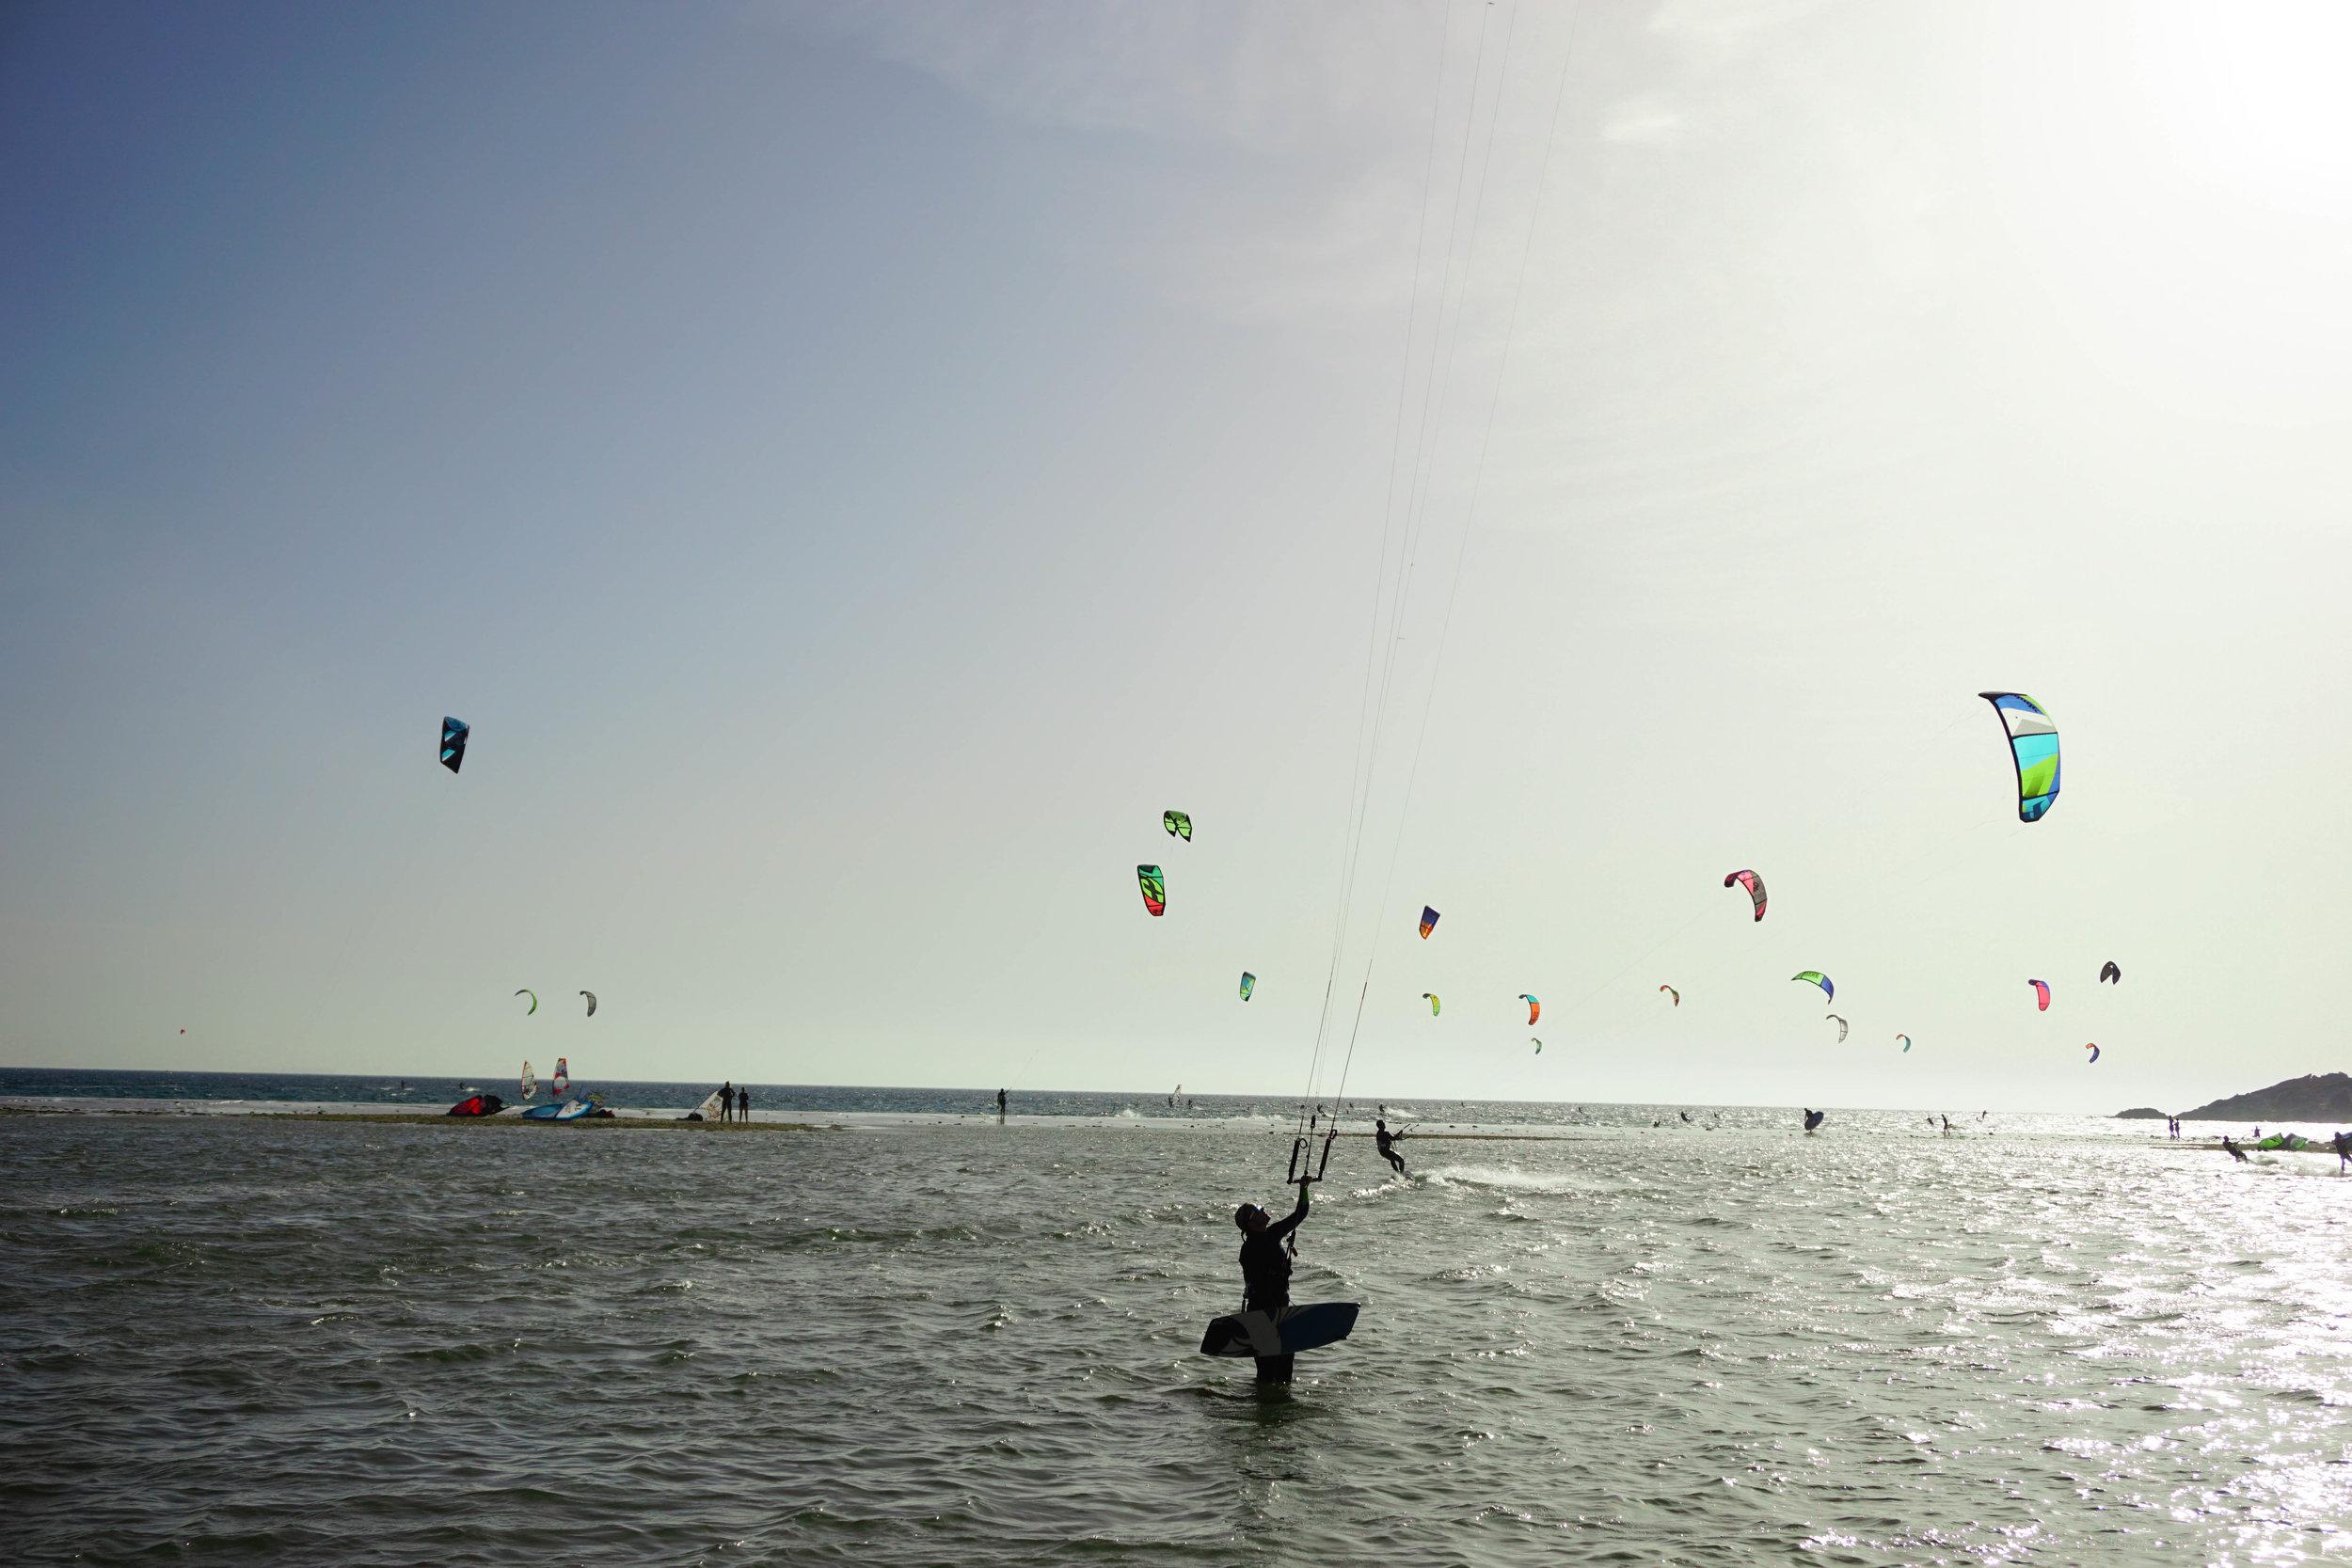 Kitesurfing in Tarifa.